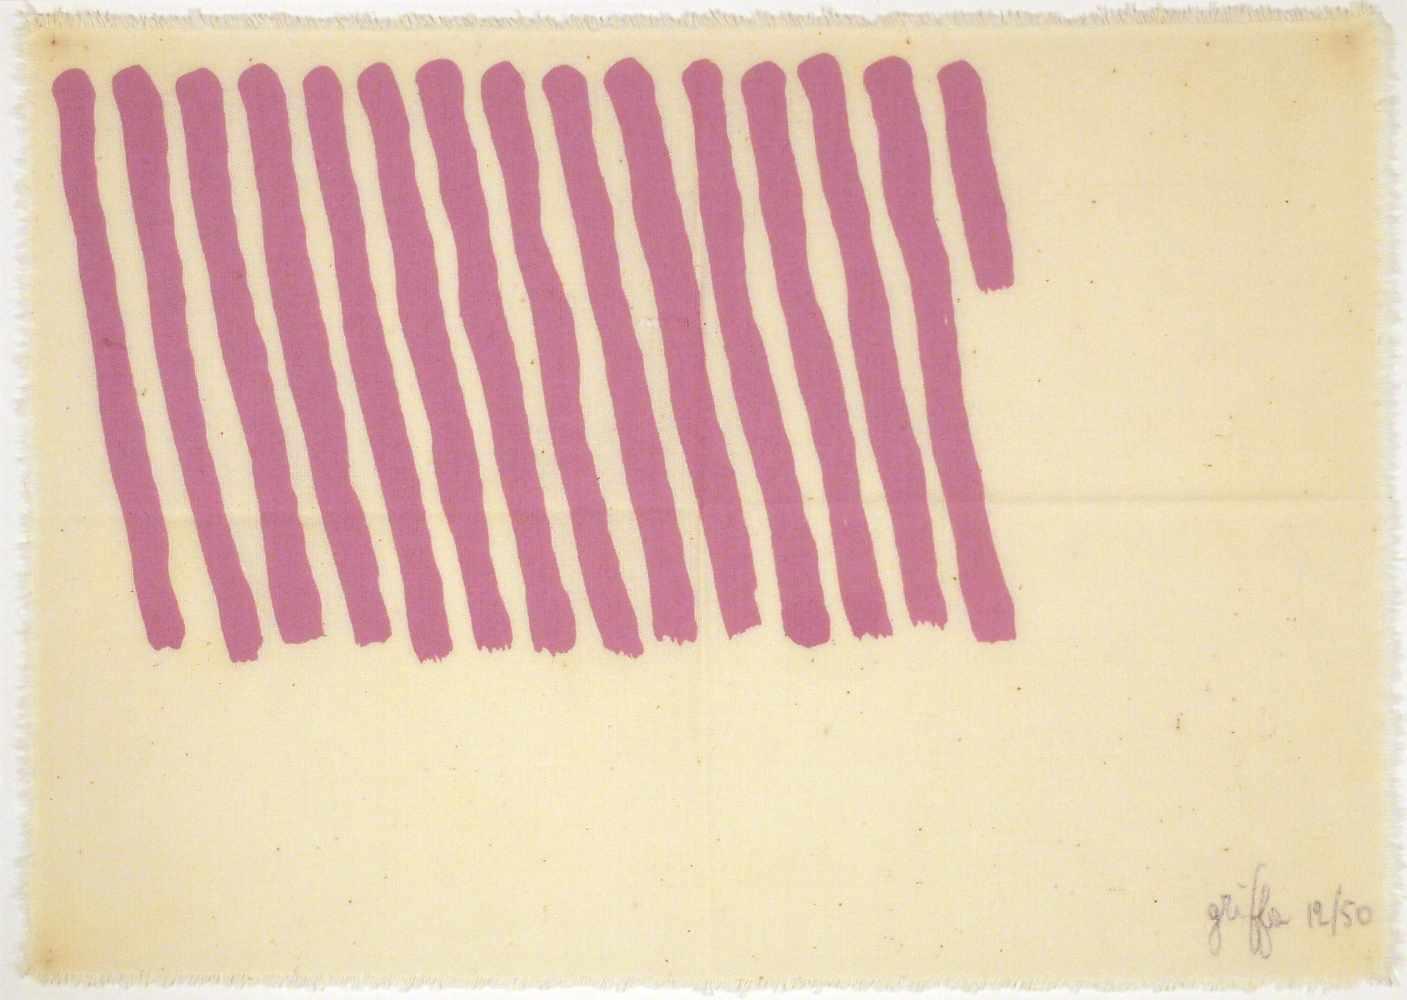 Lot 84 - Giorgio GriffaTurin 1936 - lebt in TurinOhne Titel. Aquarell. 1980. 12,2 x 16 cm. Signiert und